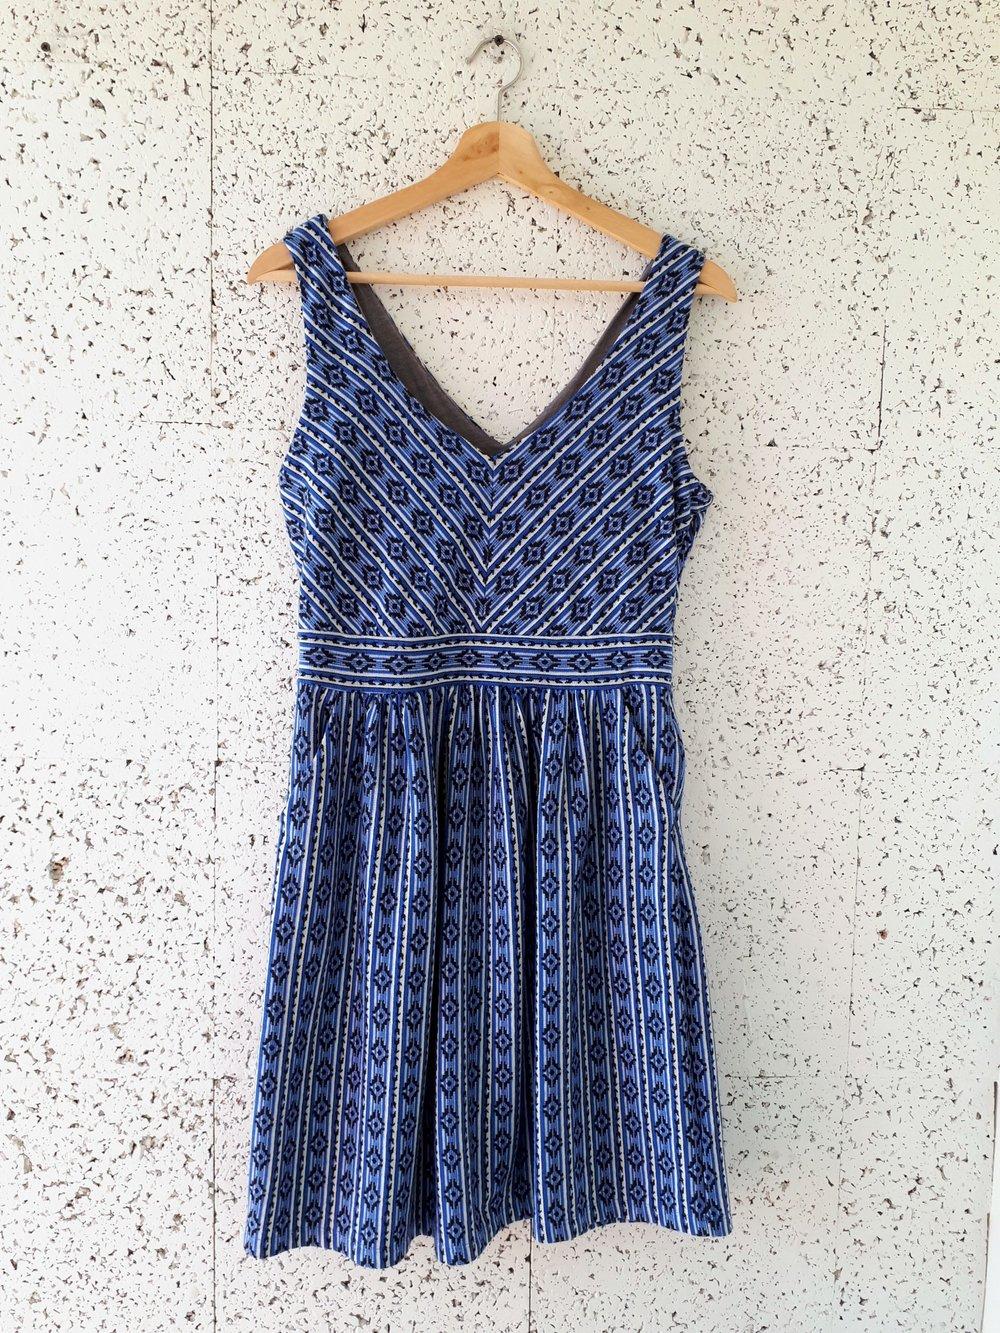 Maeve dress (NWT); Size 14, $46